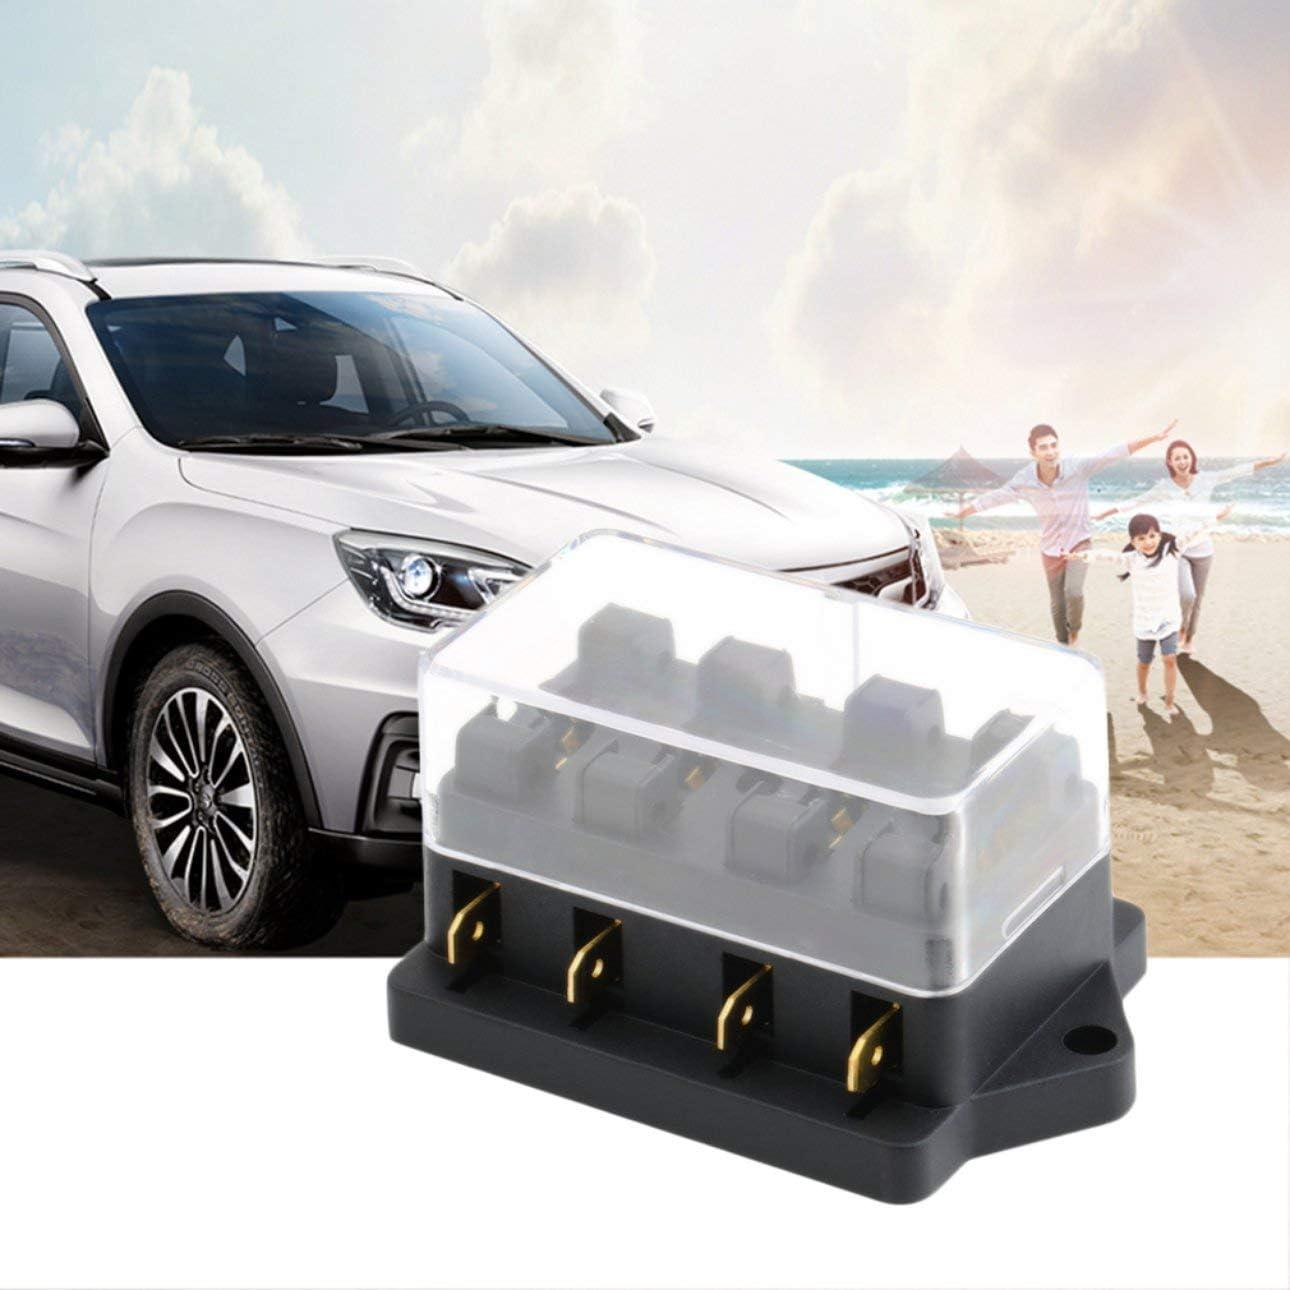 Liobaba Automotive Fuse Box,4 Way Circuit Automotive Middle-Sized Blade Standard Fuse Box Block Holder